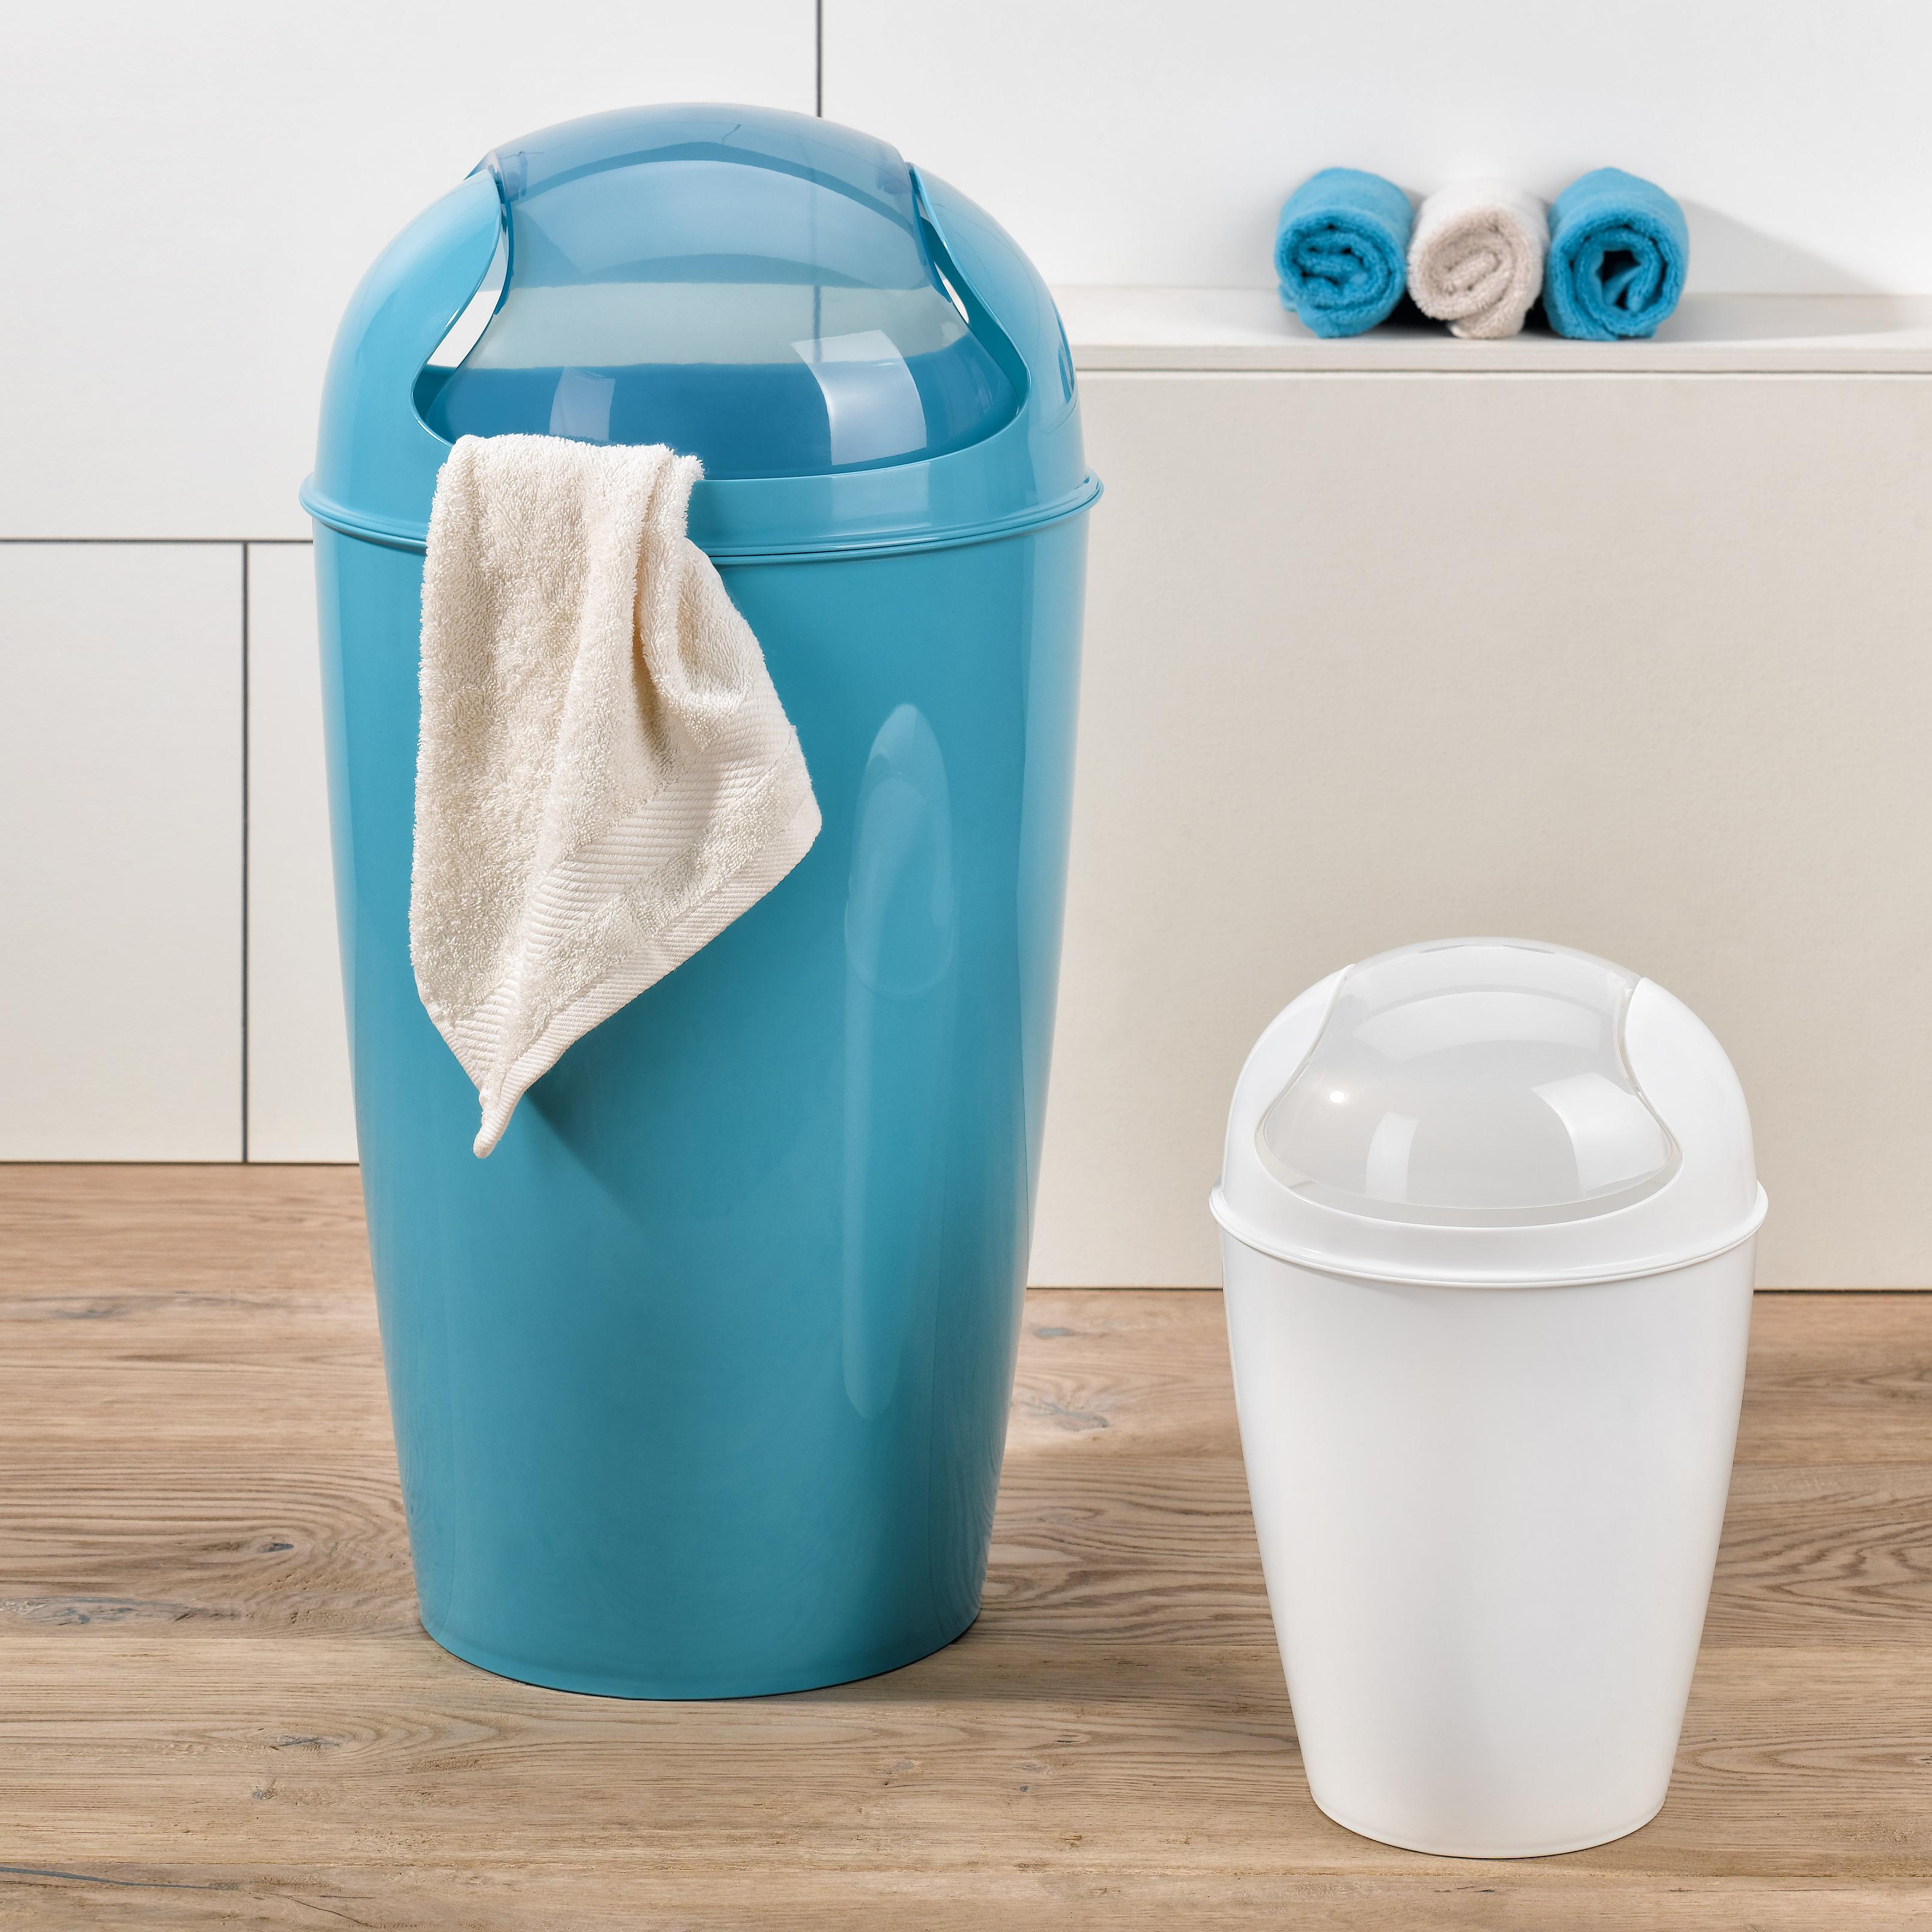 22e02a96b7a78a koziol »ideas for friends GmbH | DEL M Swing-Top Wastebasket 12l ...